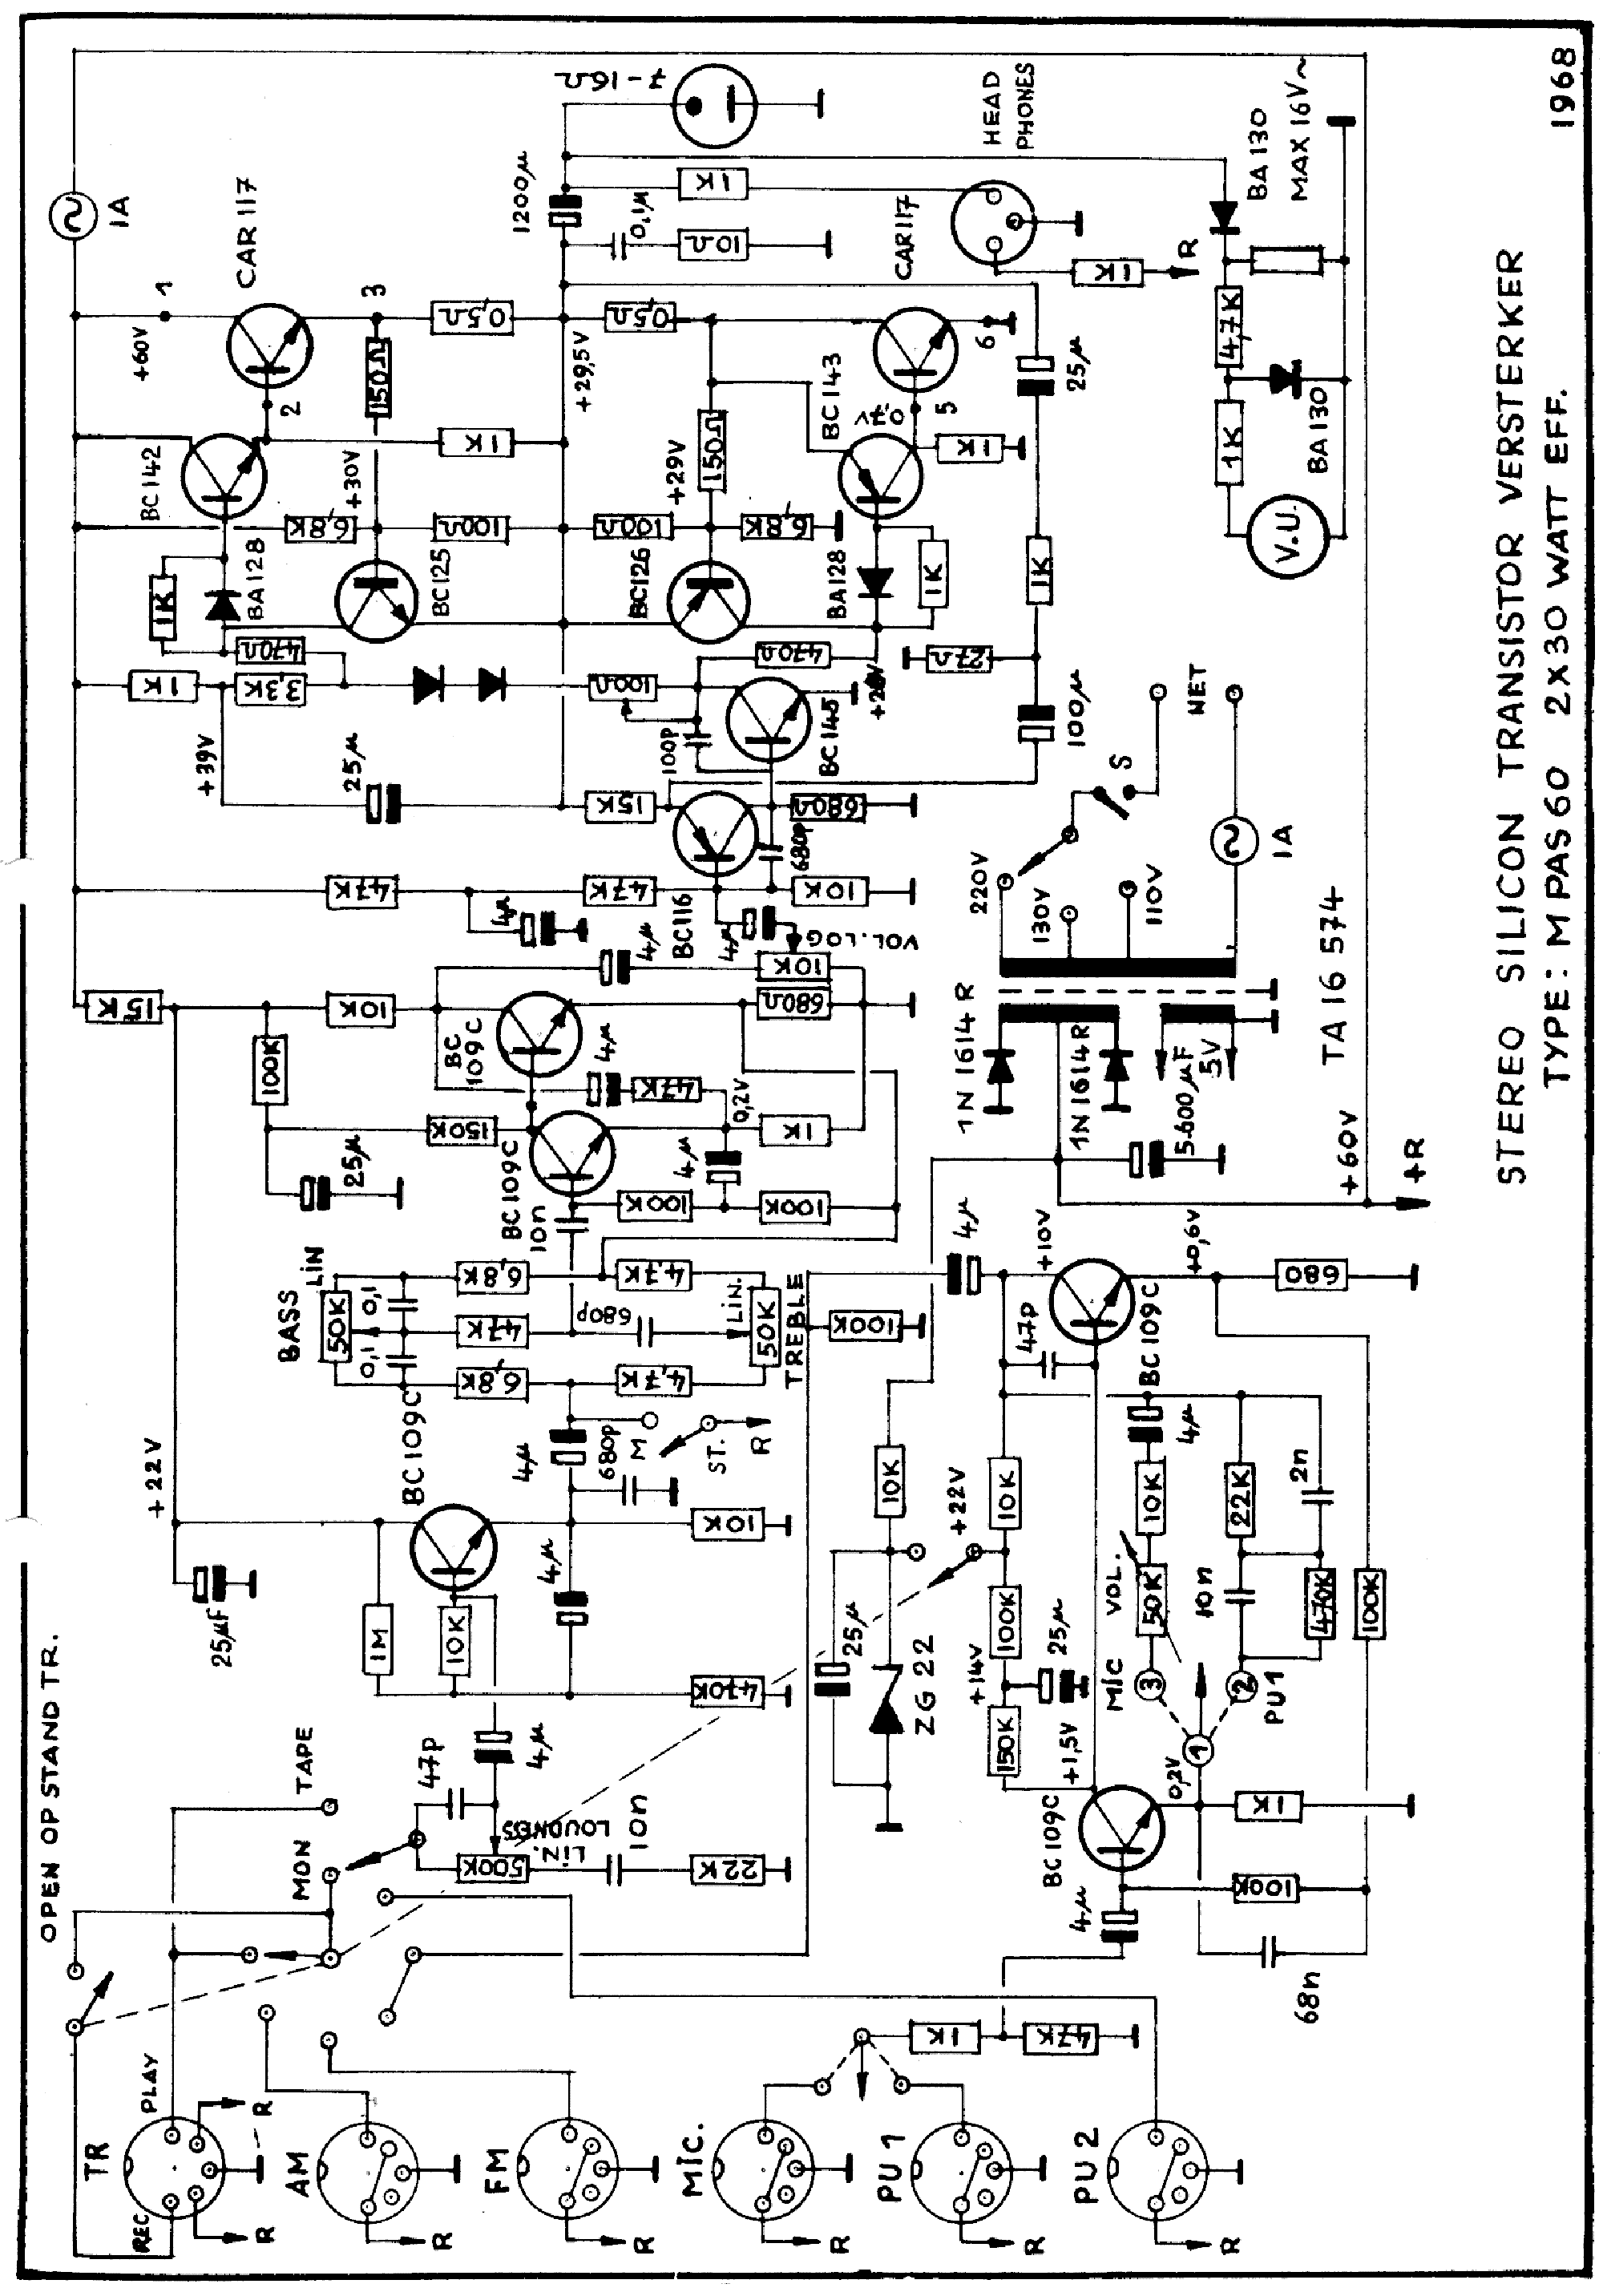 carad mpas60 2x30w stereo transistor amplifier sch service manual download  schematics  eeprom